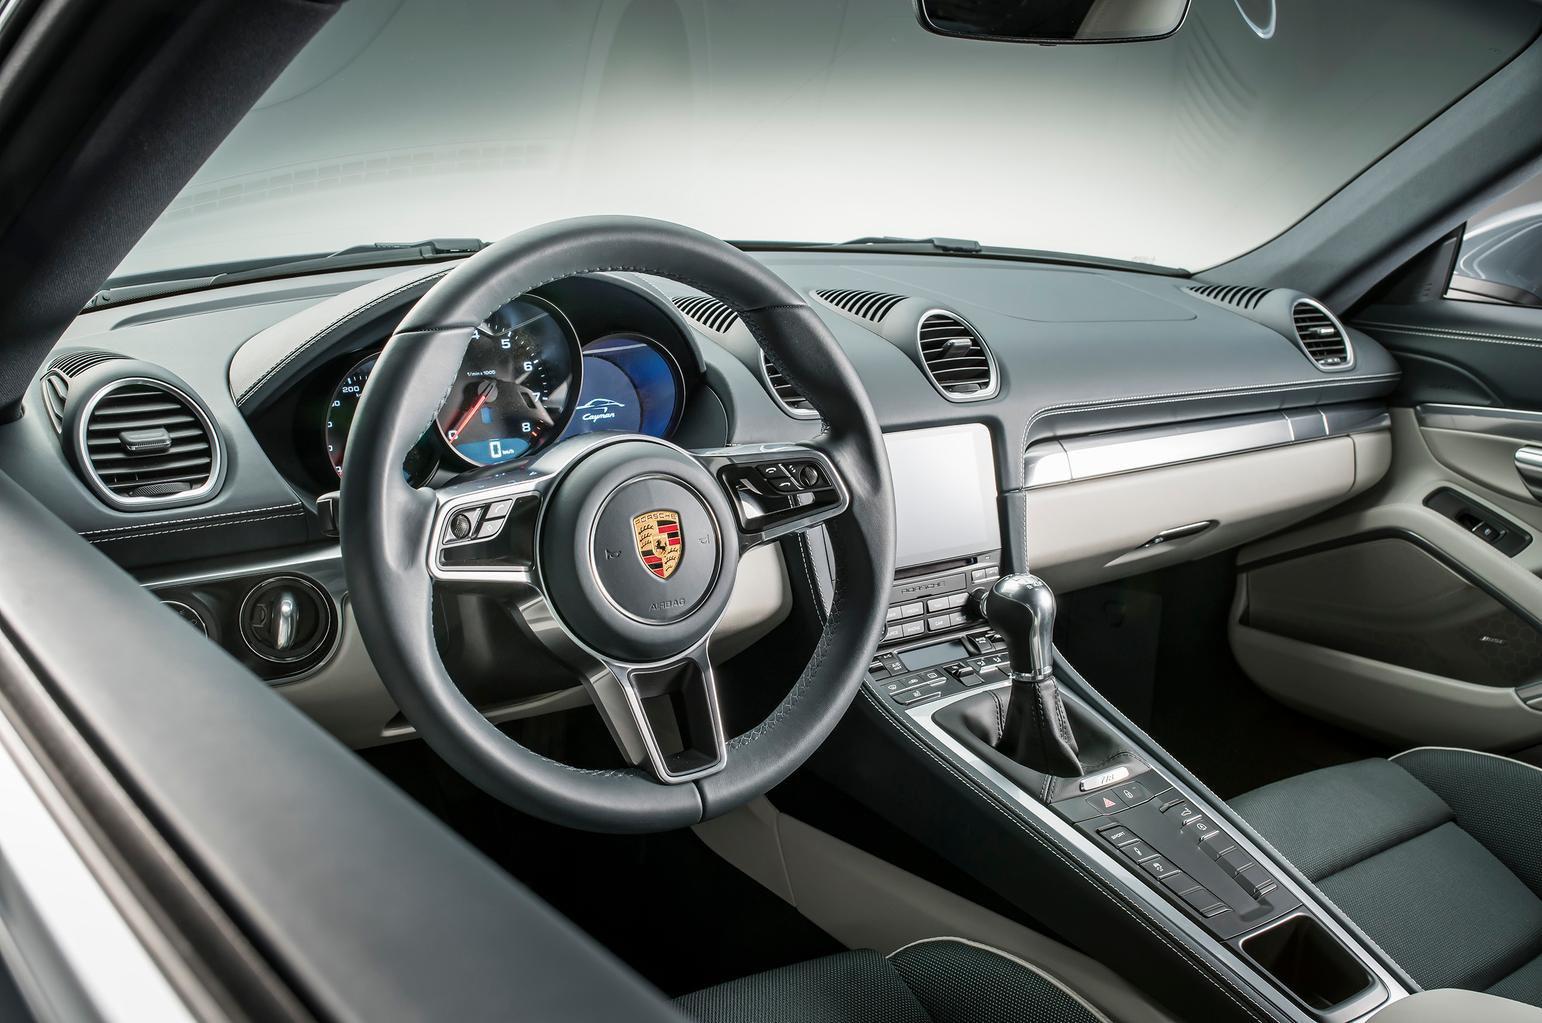 New Porsche 718 Cayman revealed